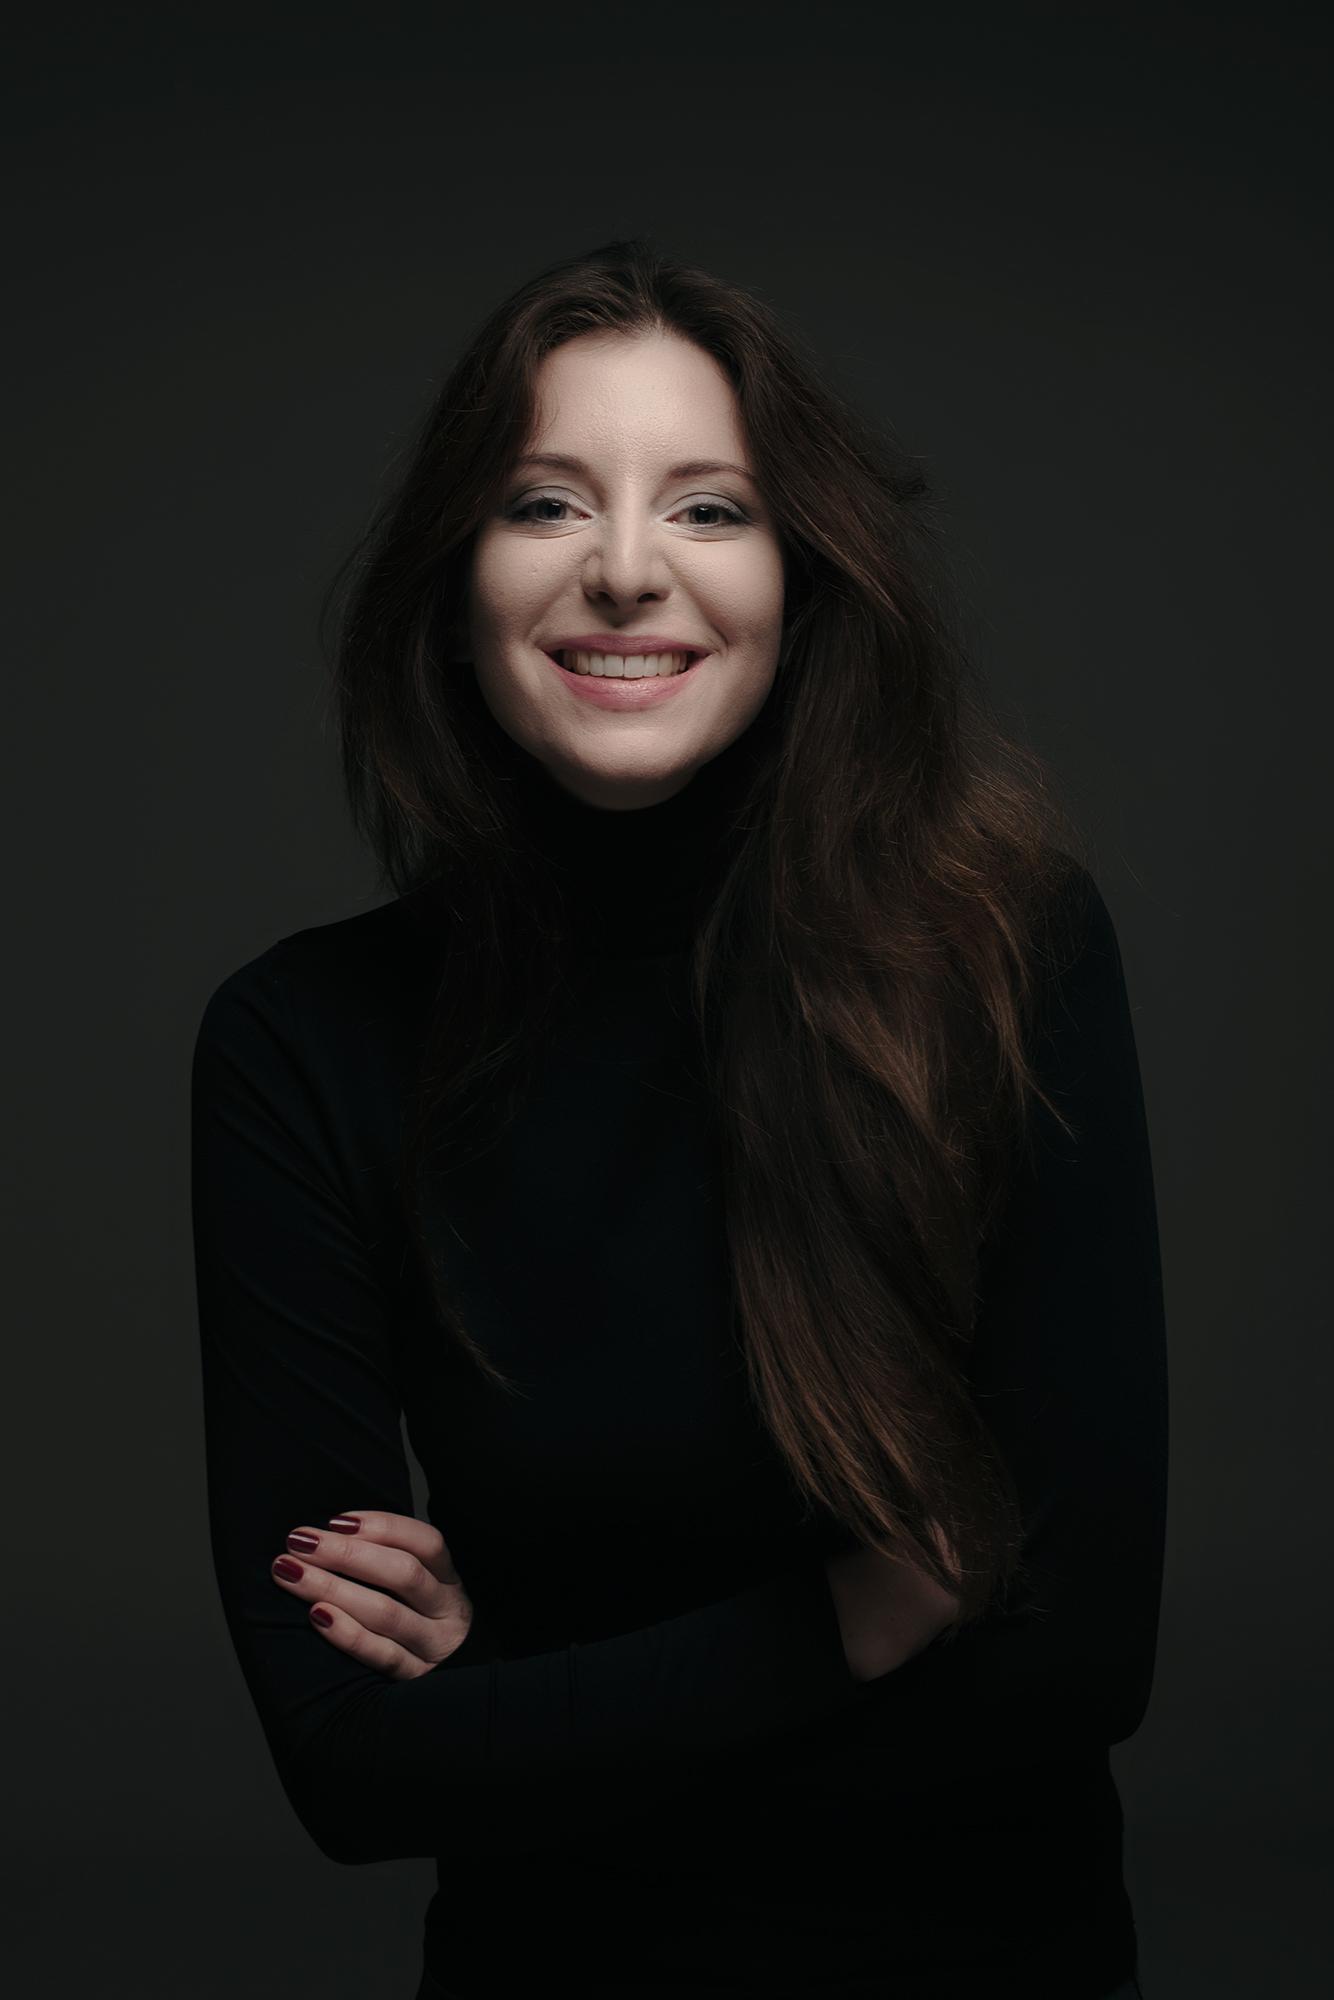 Katarzyna Głogowska IQ ART Agencja Aktorska (8)